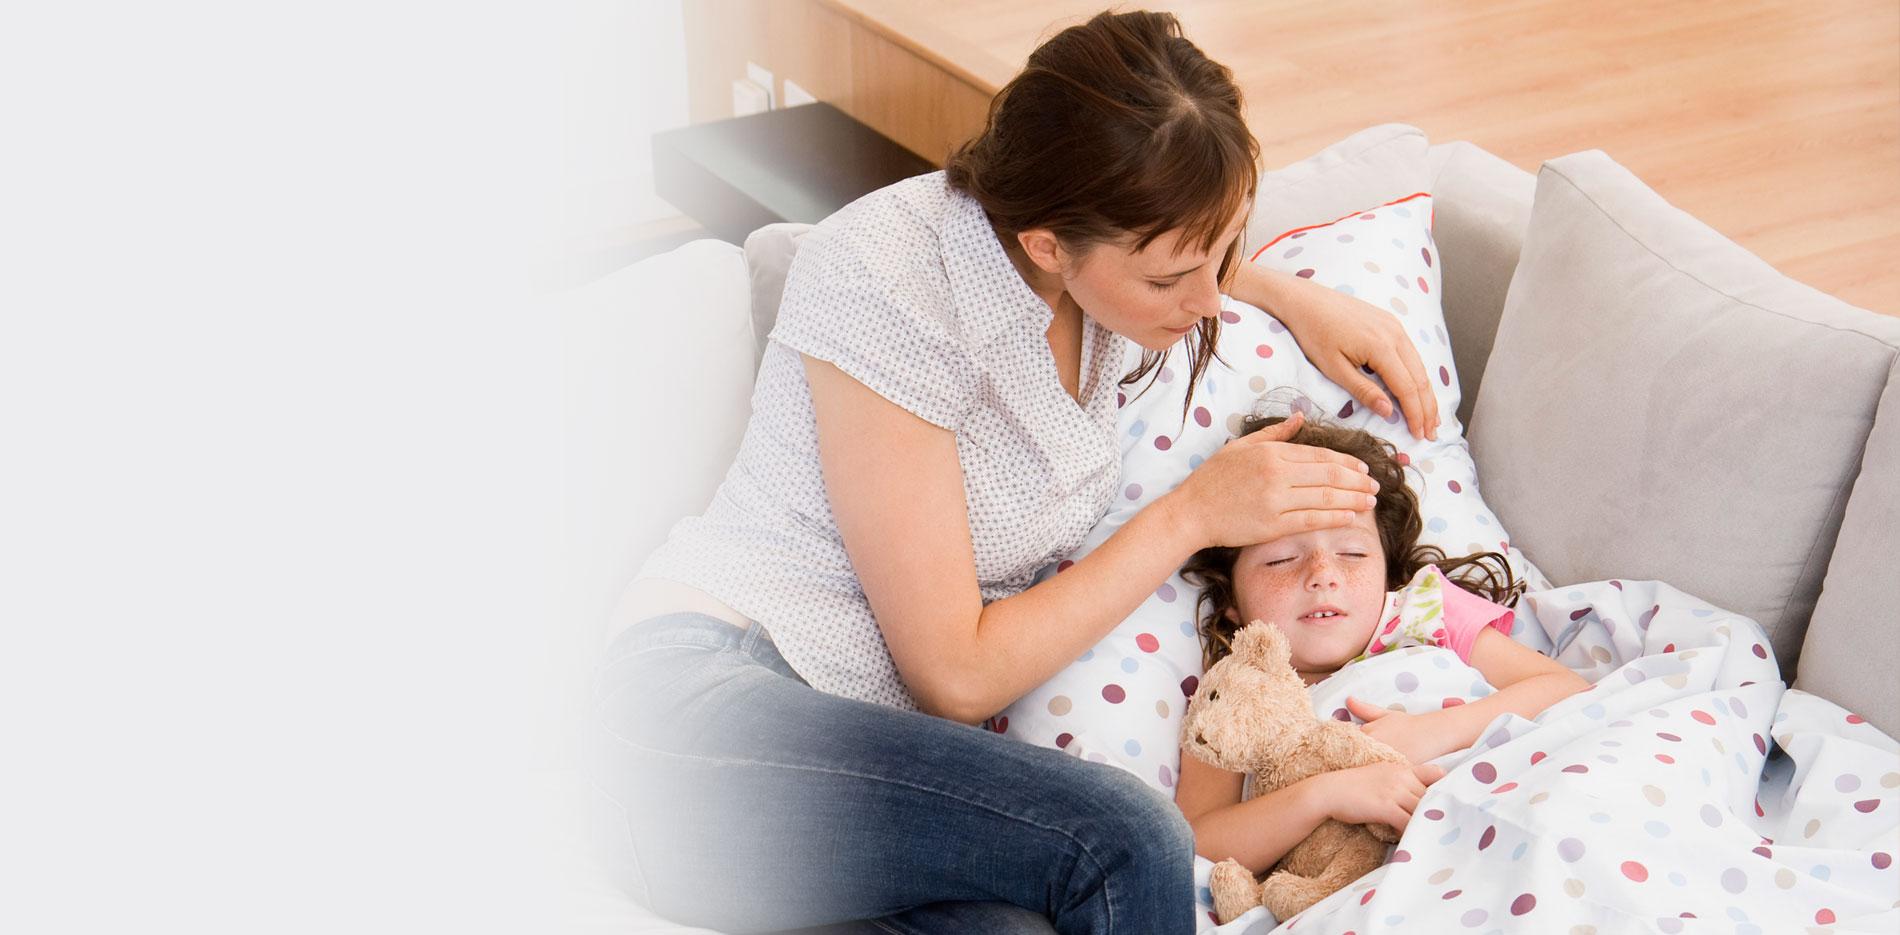 Alliance Urgent Care and Pediatric Specialties | Cook Children's